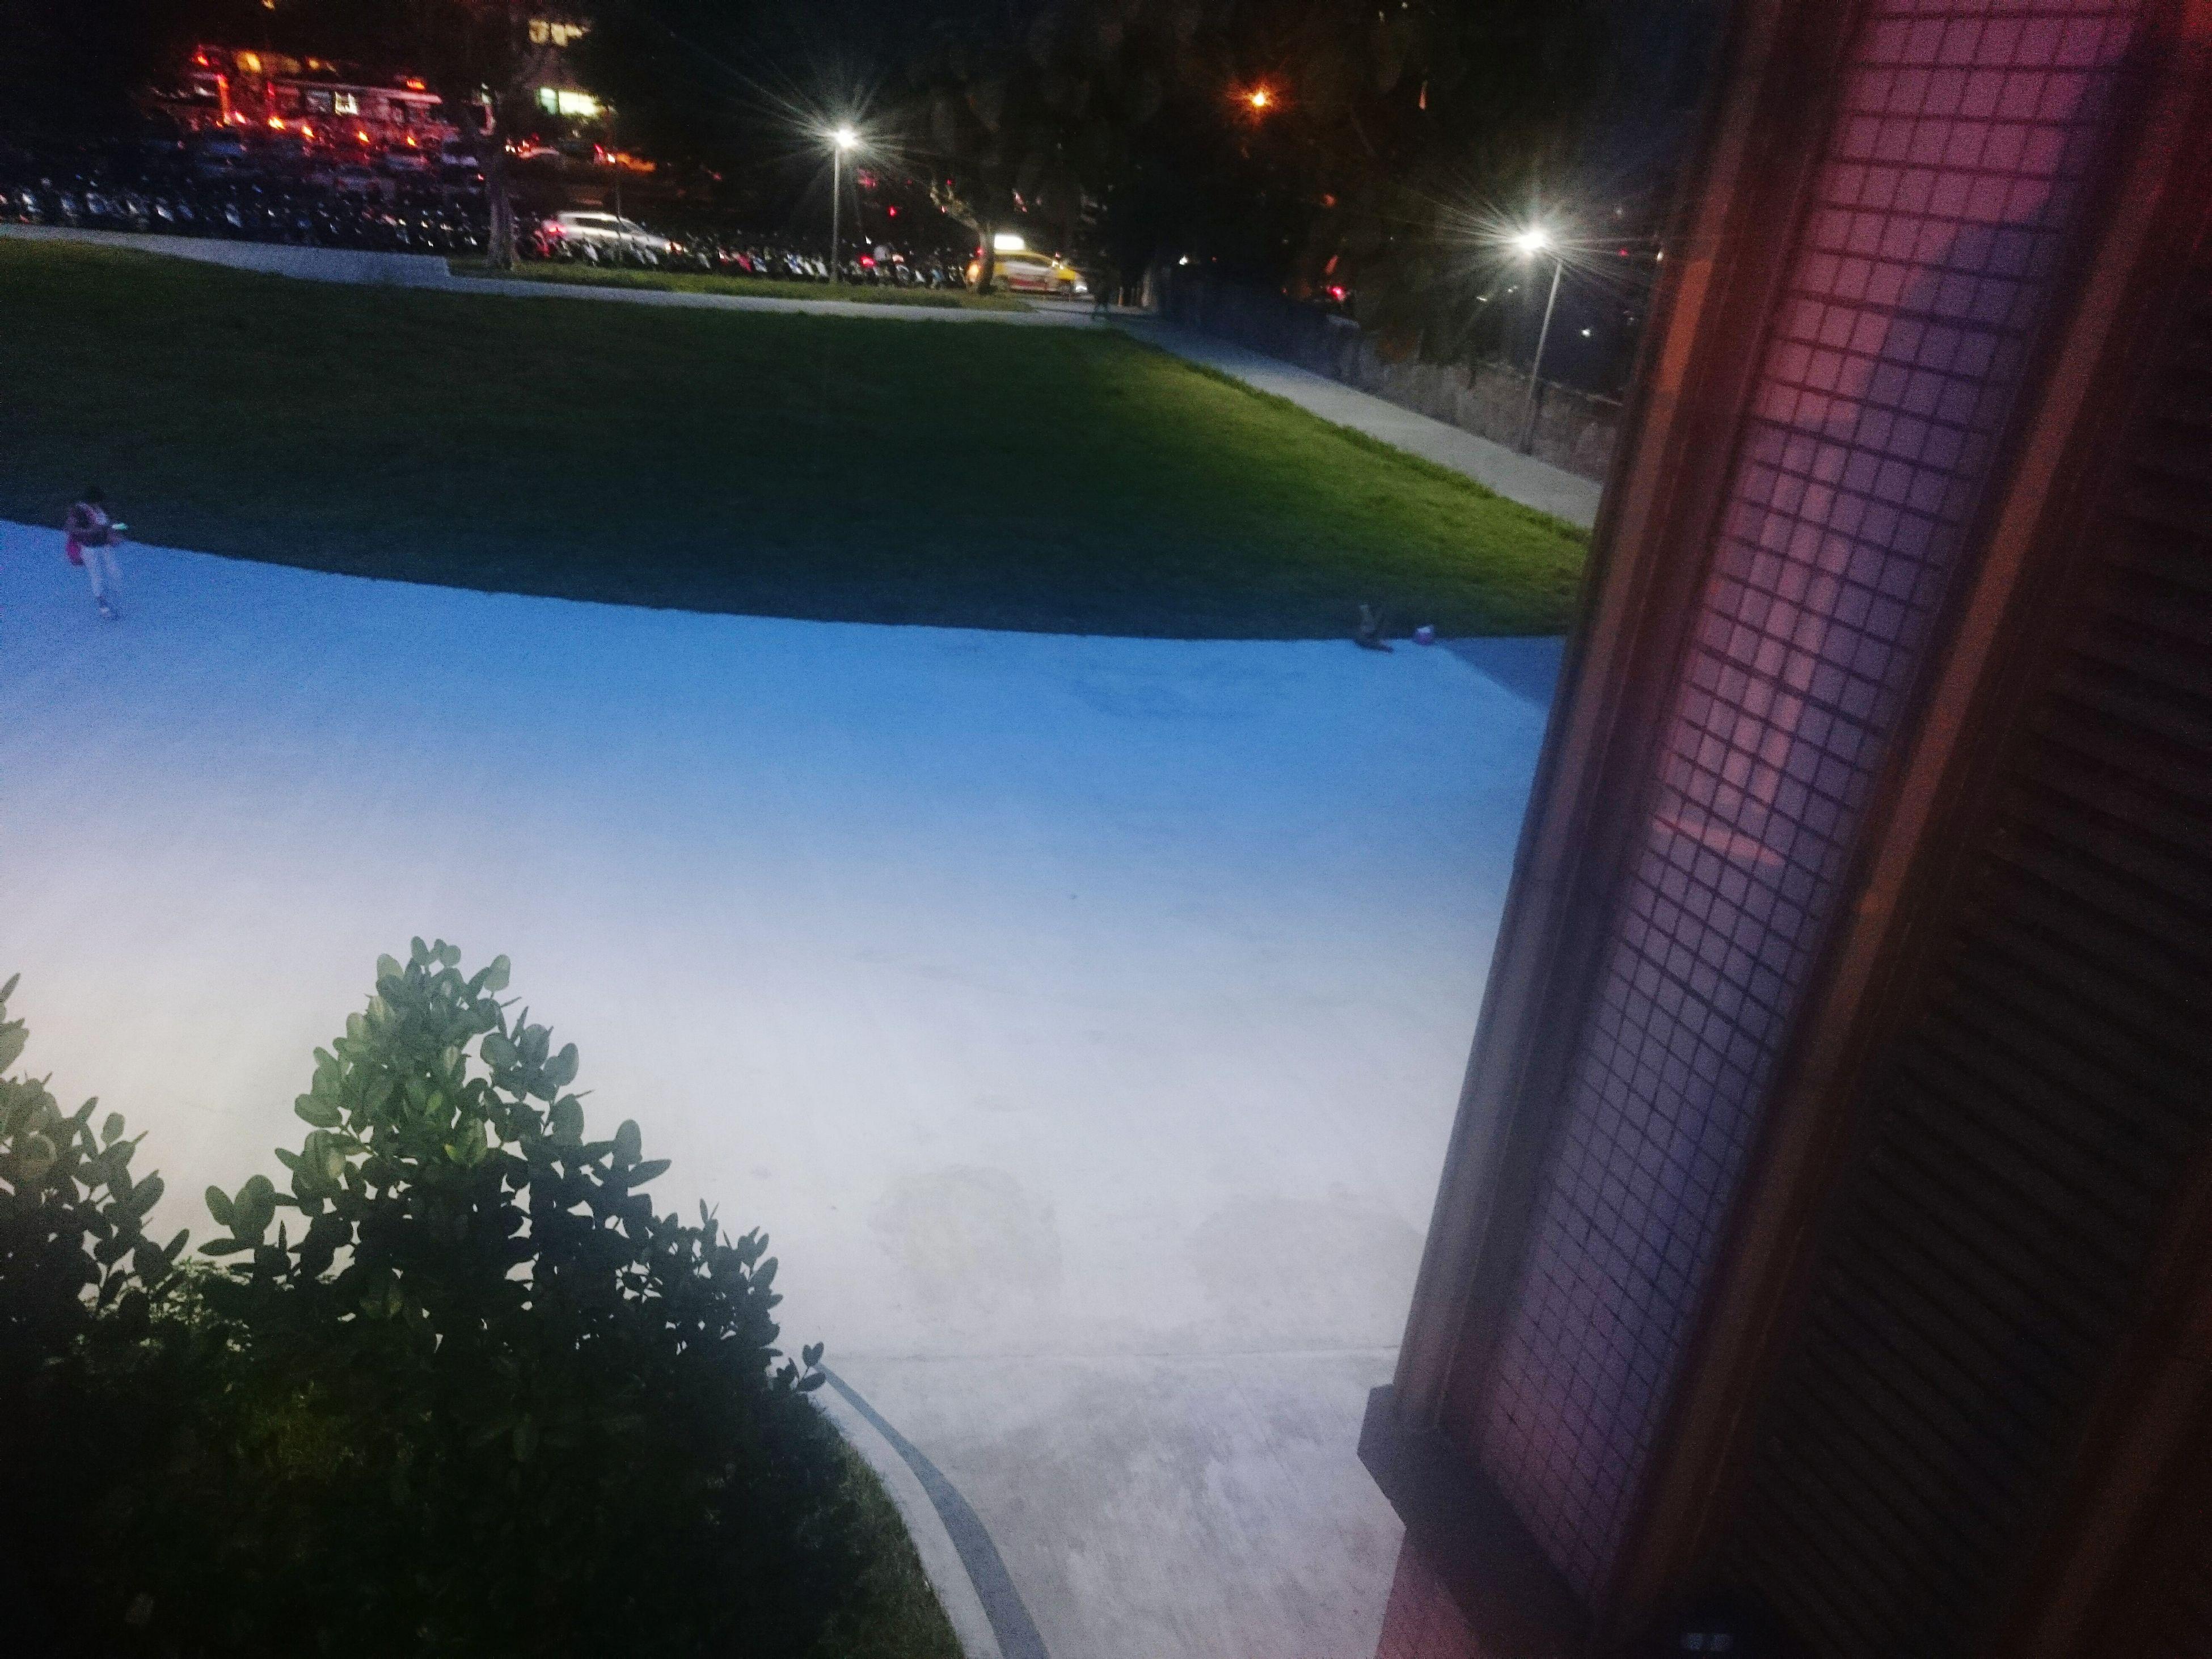 illuminated, window, transparent, glass - material, street light, night, blue, water, sky, nature, dark, tranquility